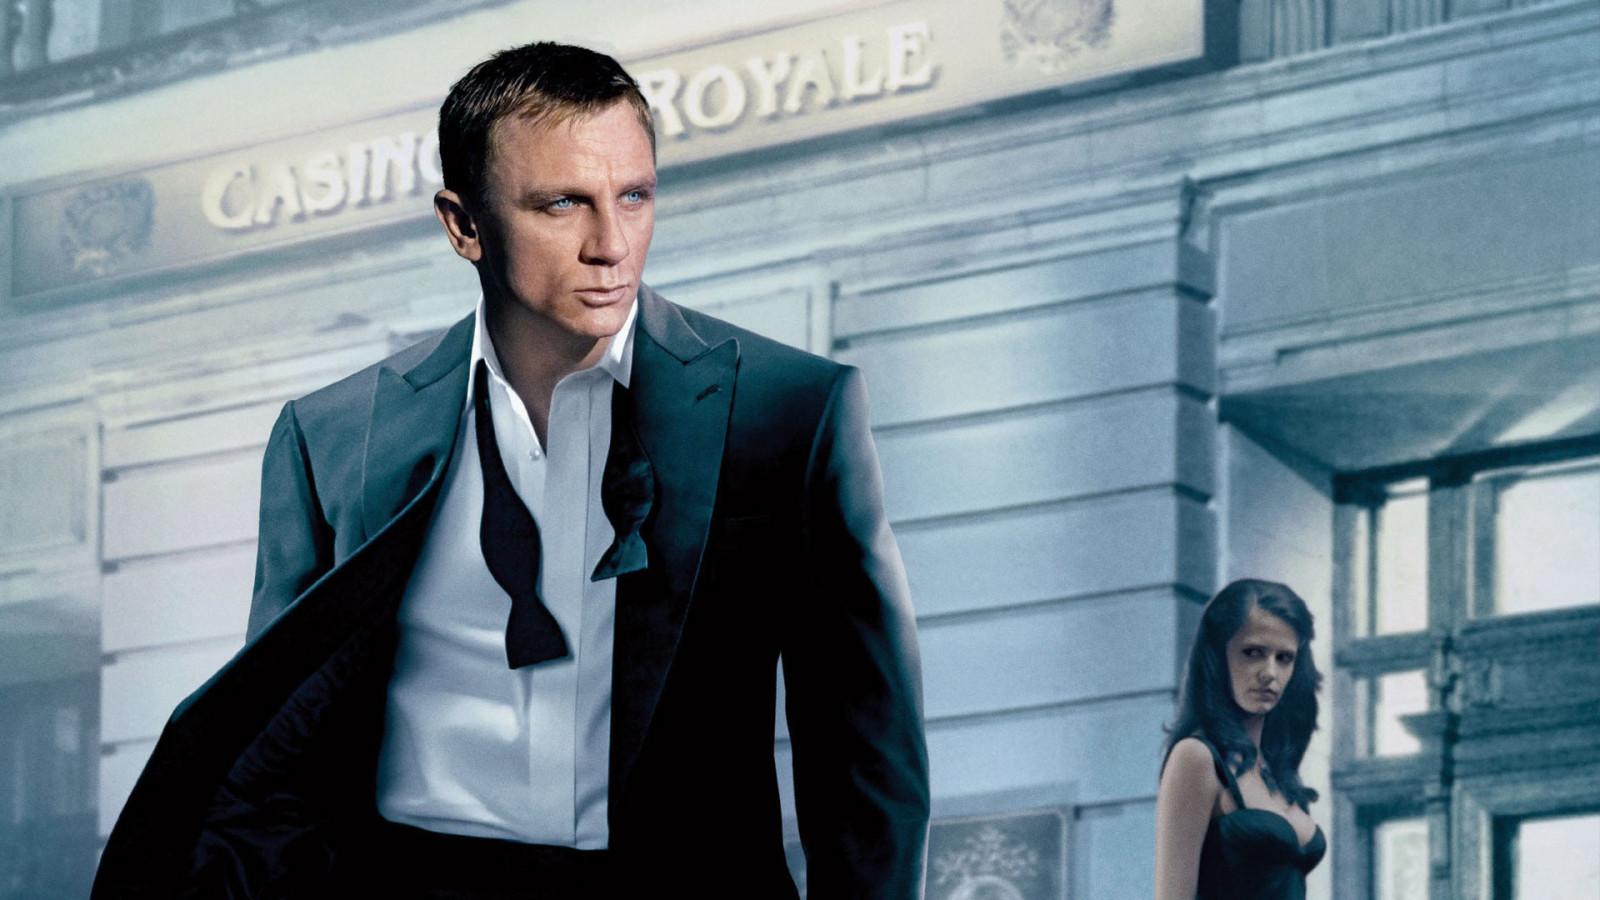 casino royal anzug